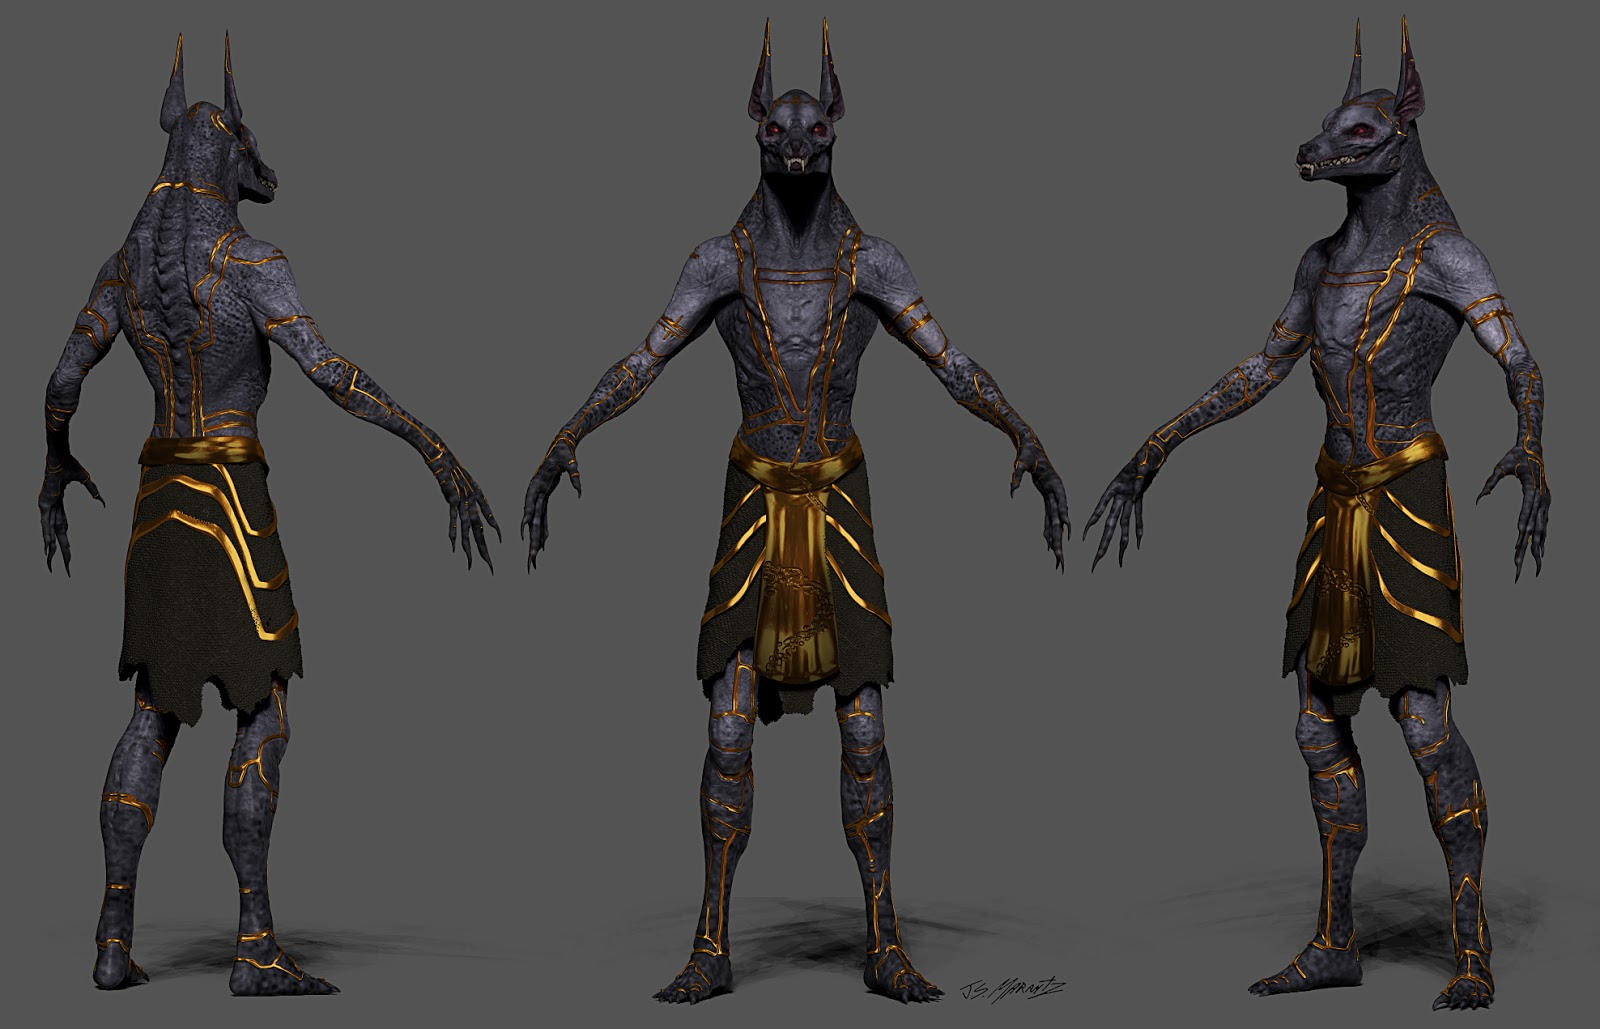 Egypt Warrior Illustration Anubis Pyramid Fantasy Art: Gods Of Egypt Concept Art